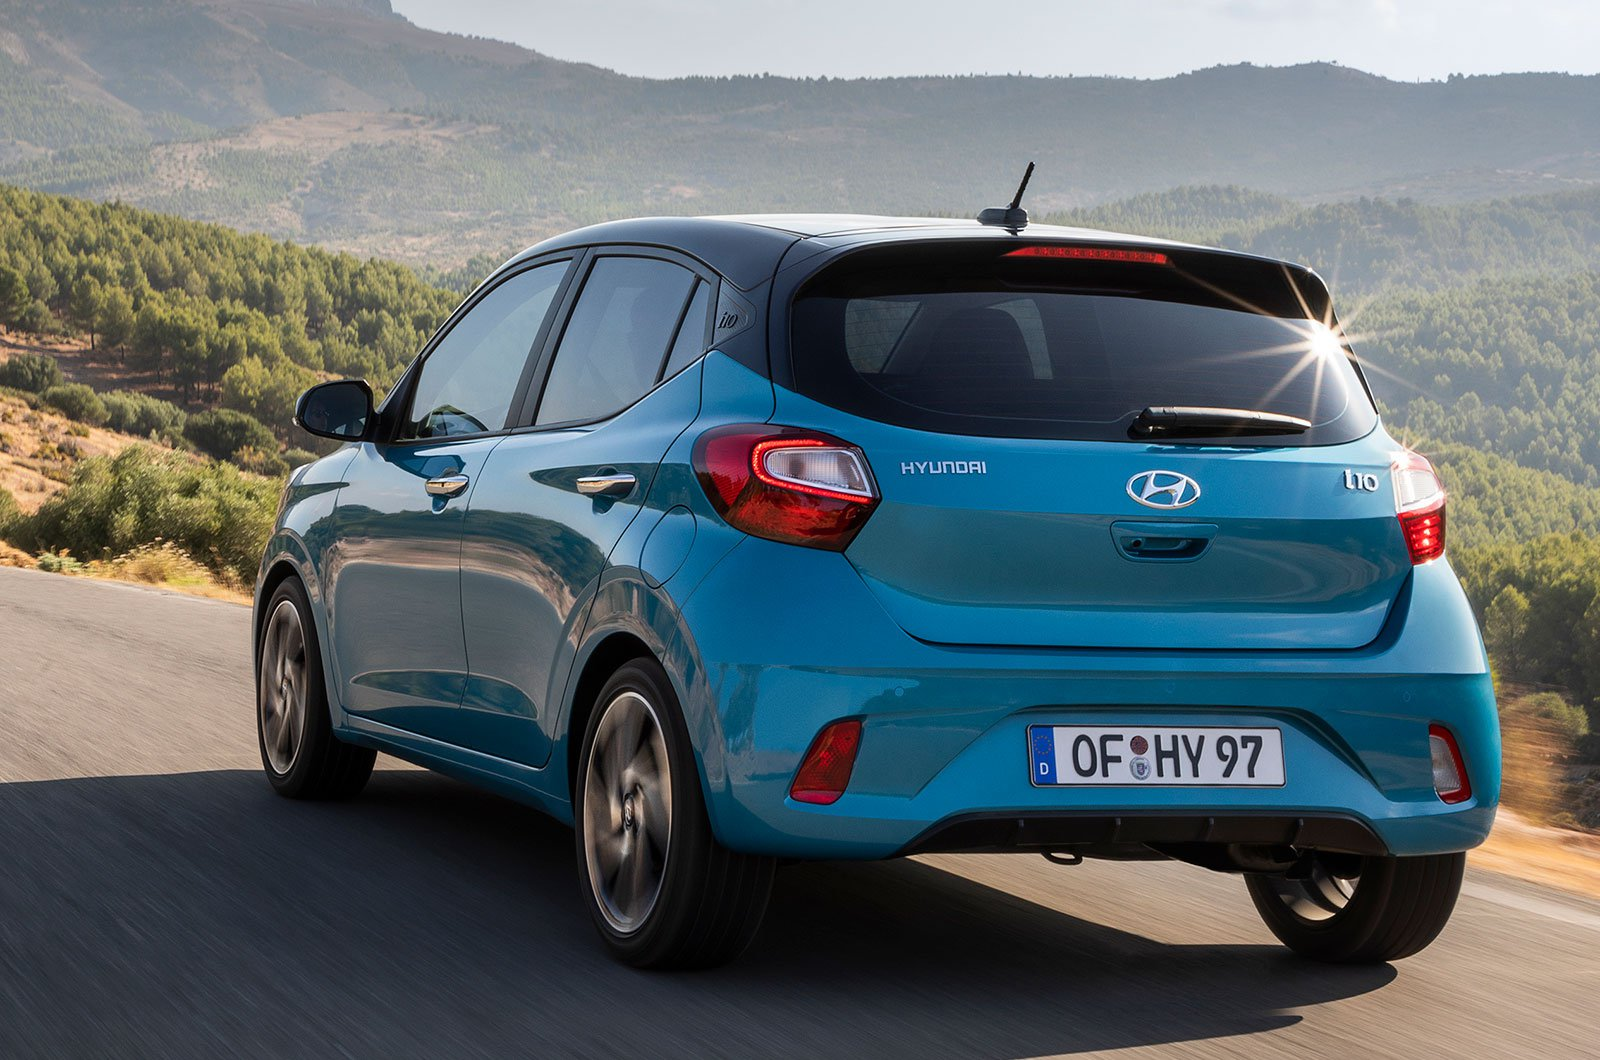 2020 Hyundai i10 rear